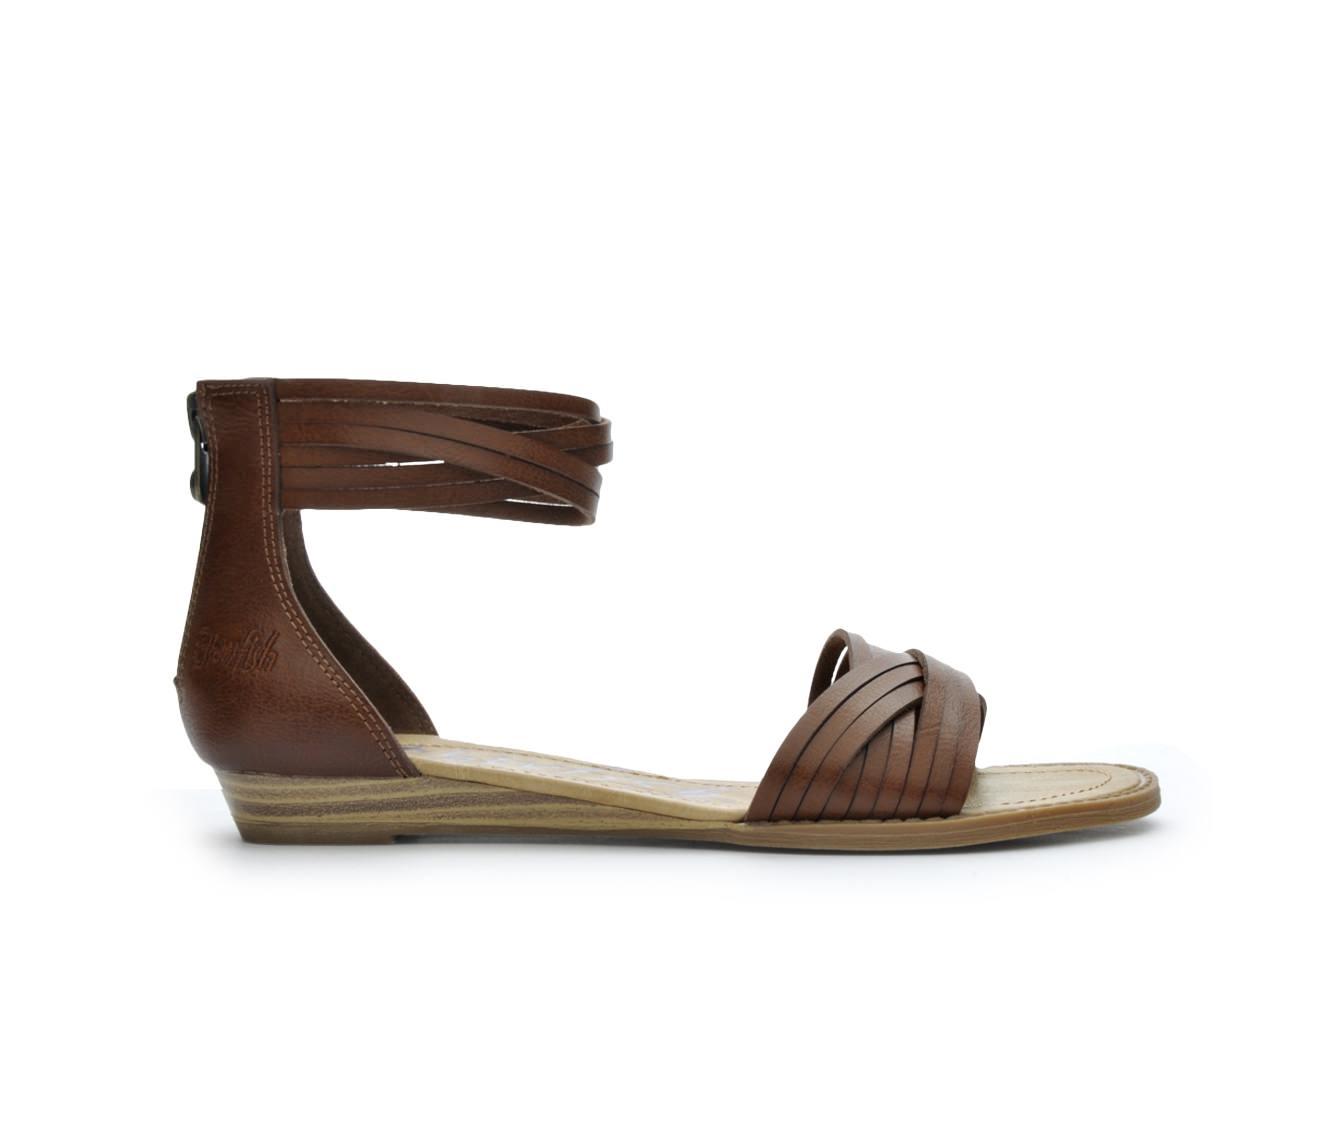 Women's Blowfish Malibu Baot Sandals (Brown)